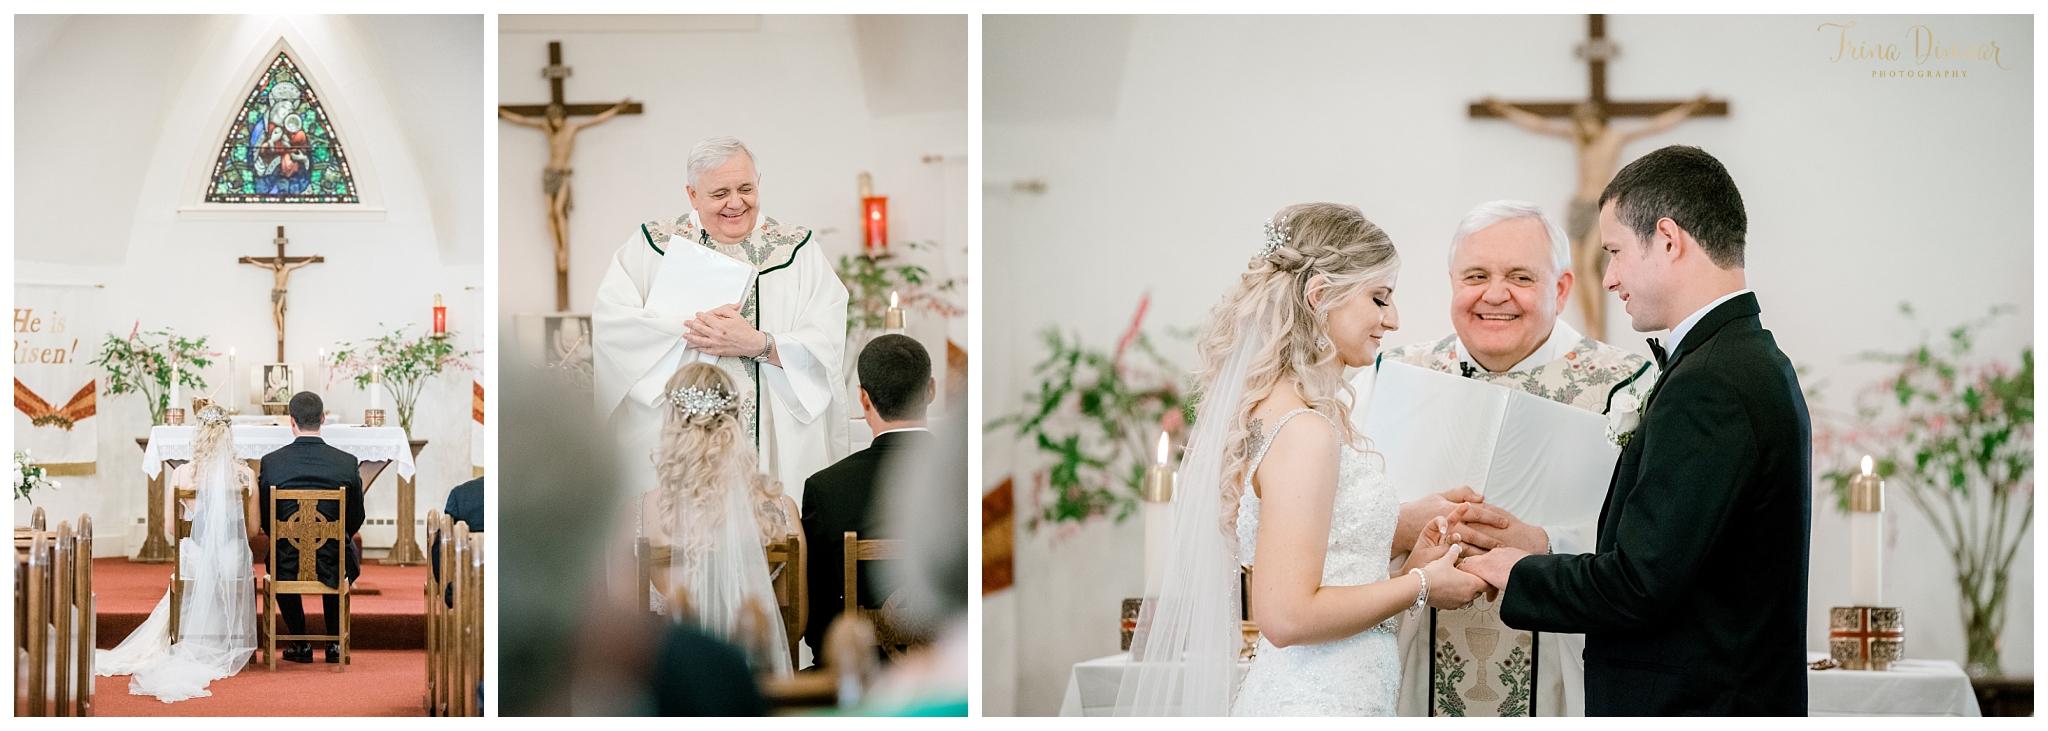 Catholic Wedding Ceremony at Our Lady of Good Hope Camden, Maine.